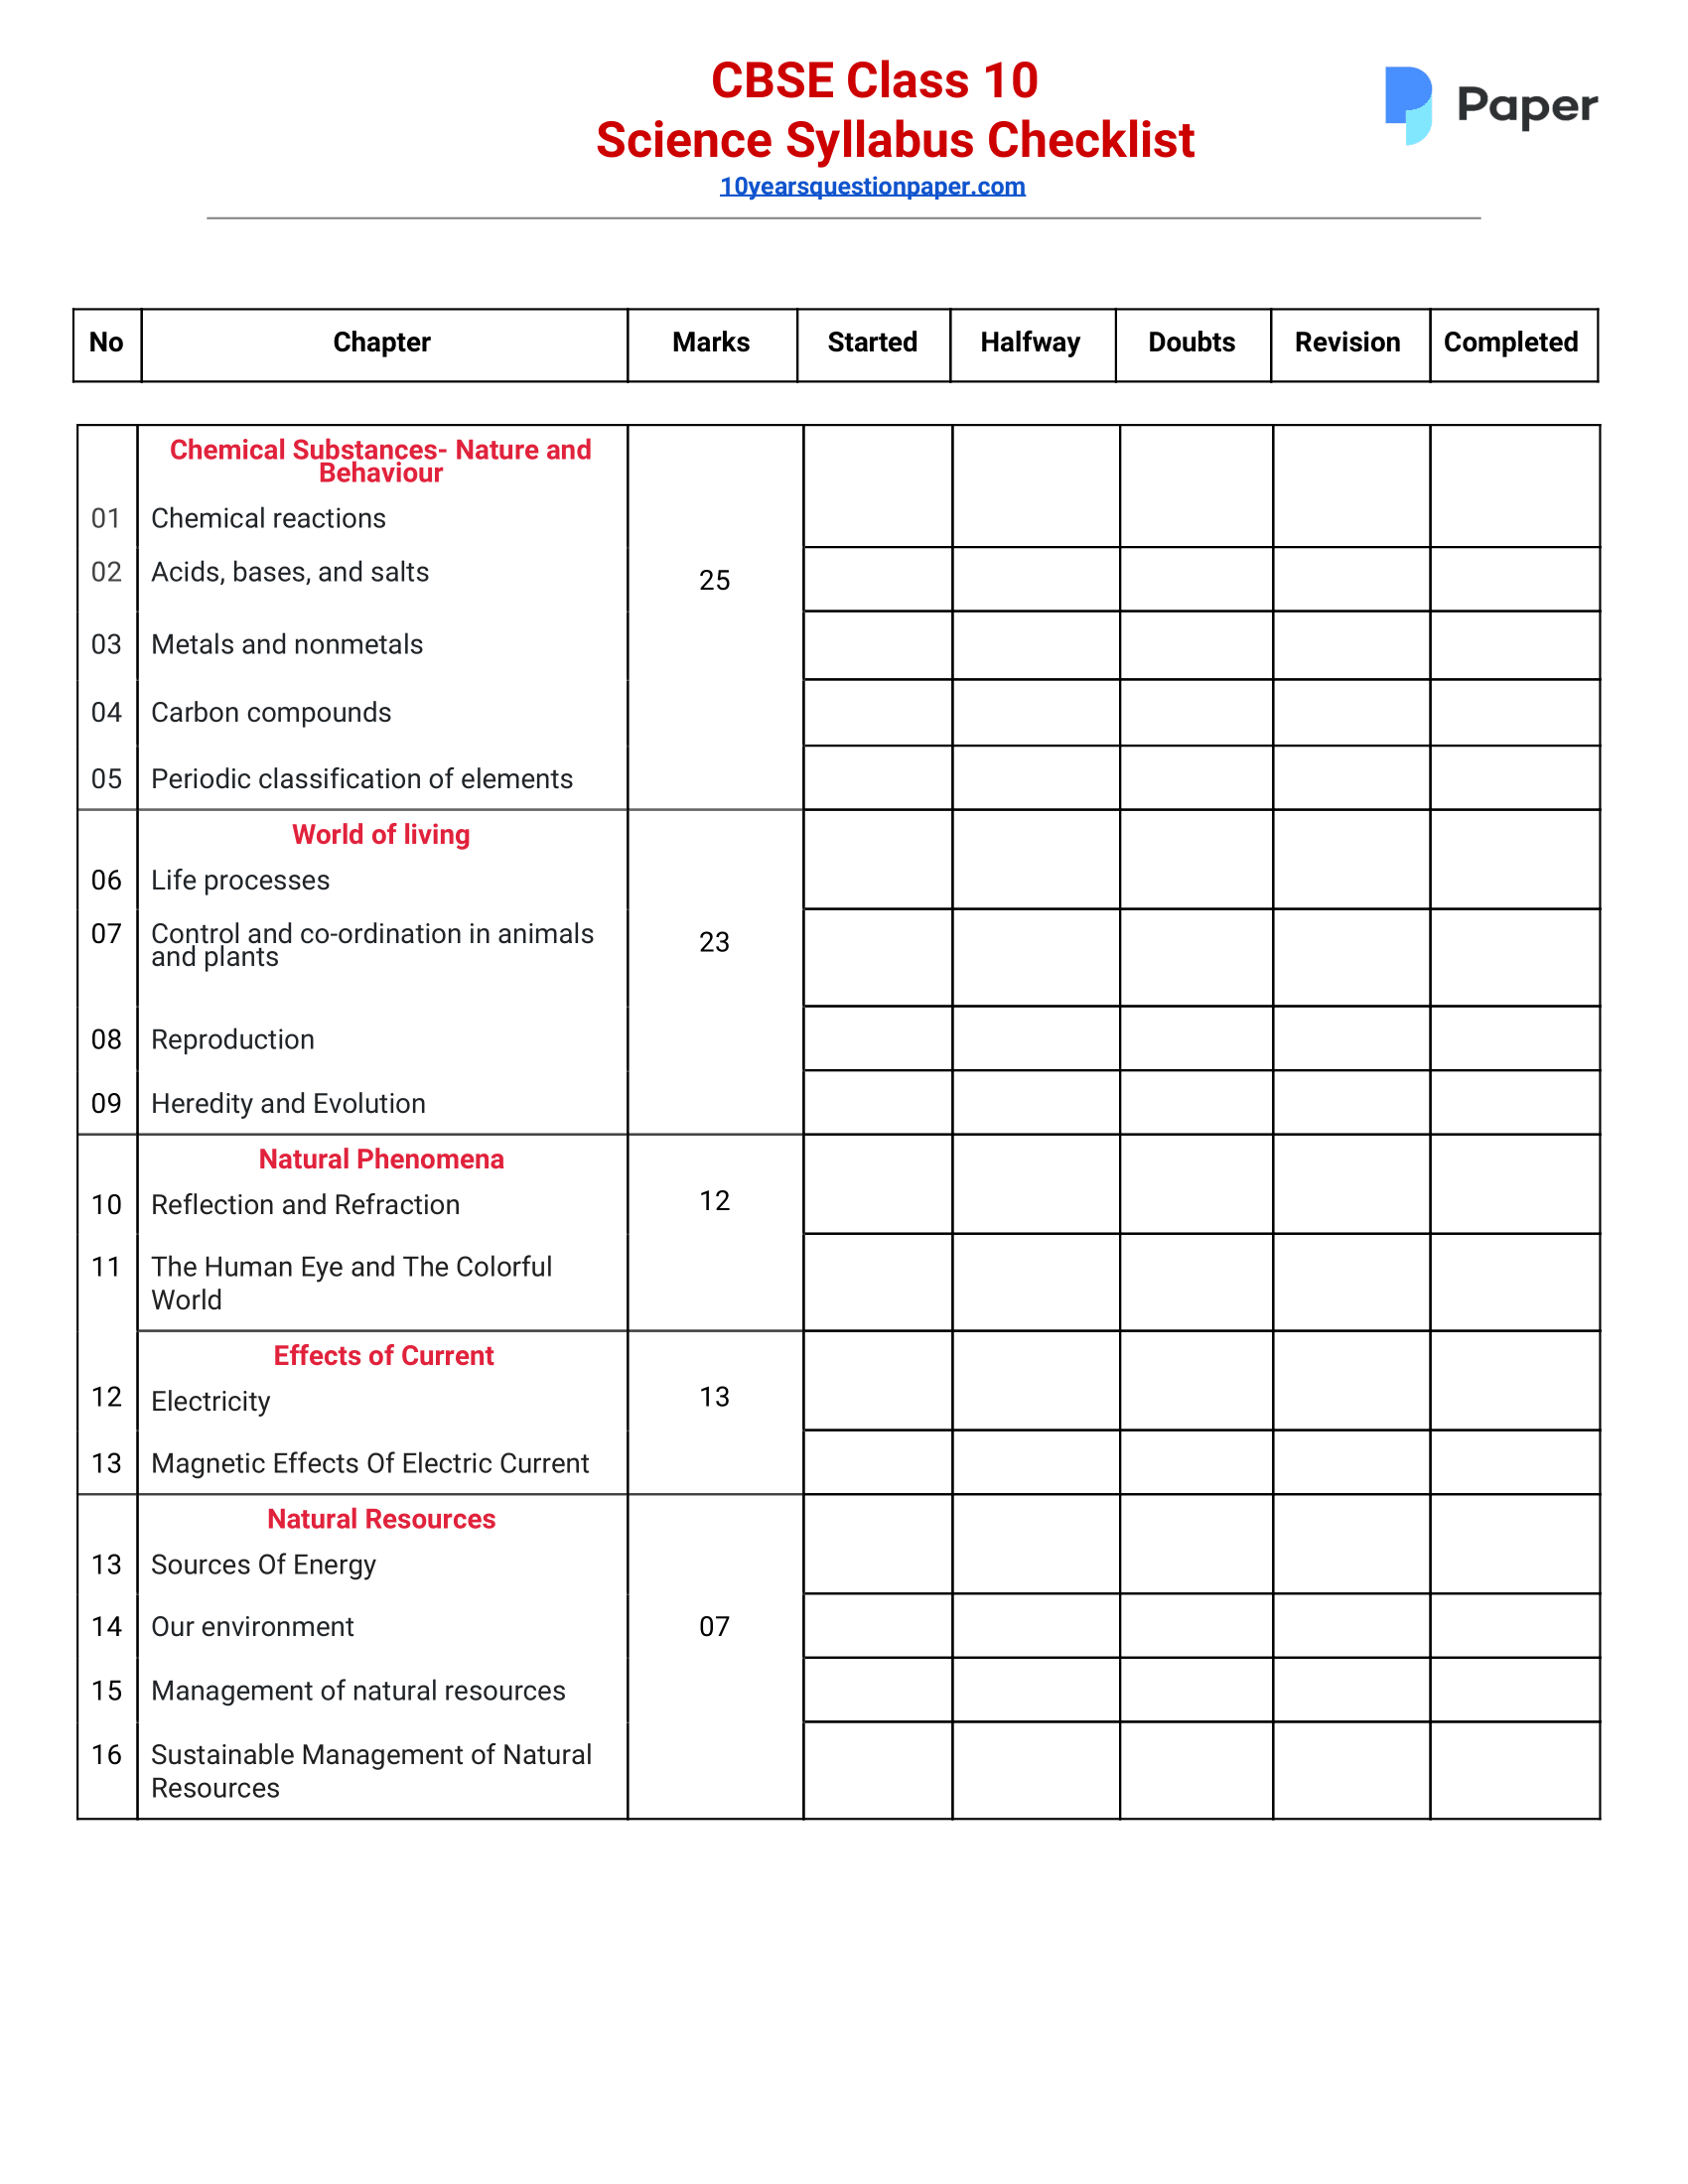 CBSE Class 10 Science Syllabus CheckList